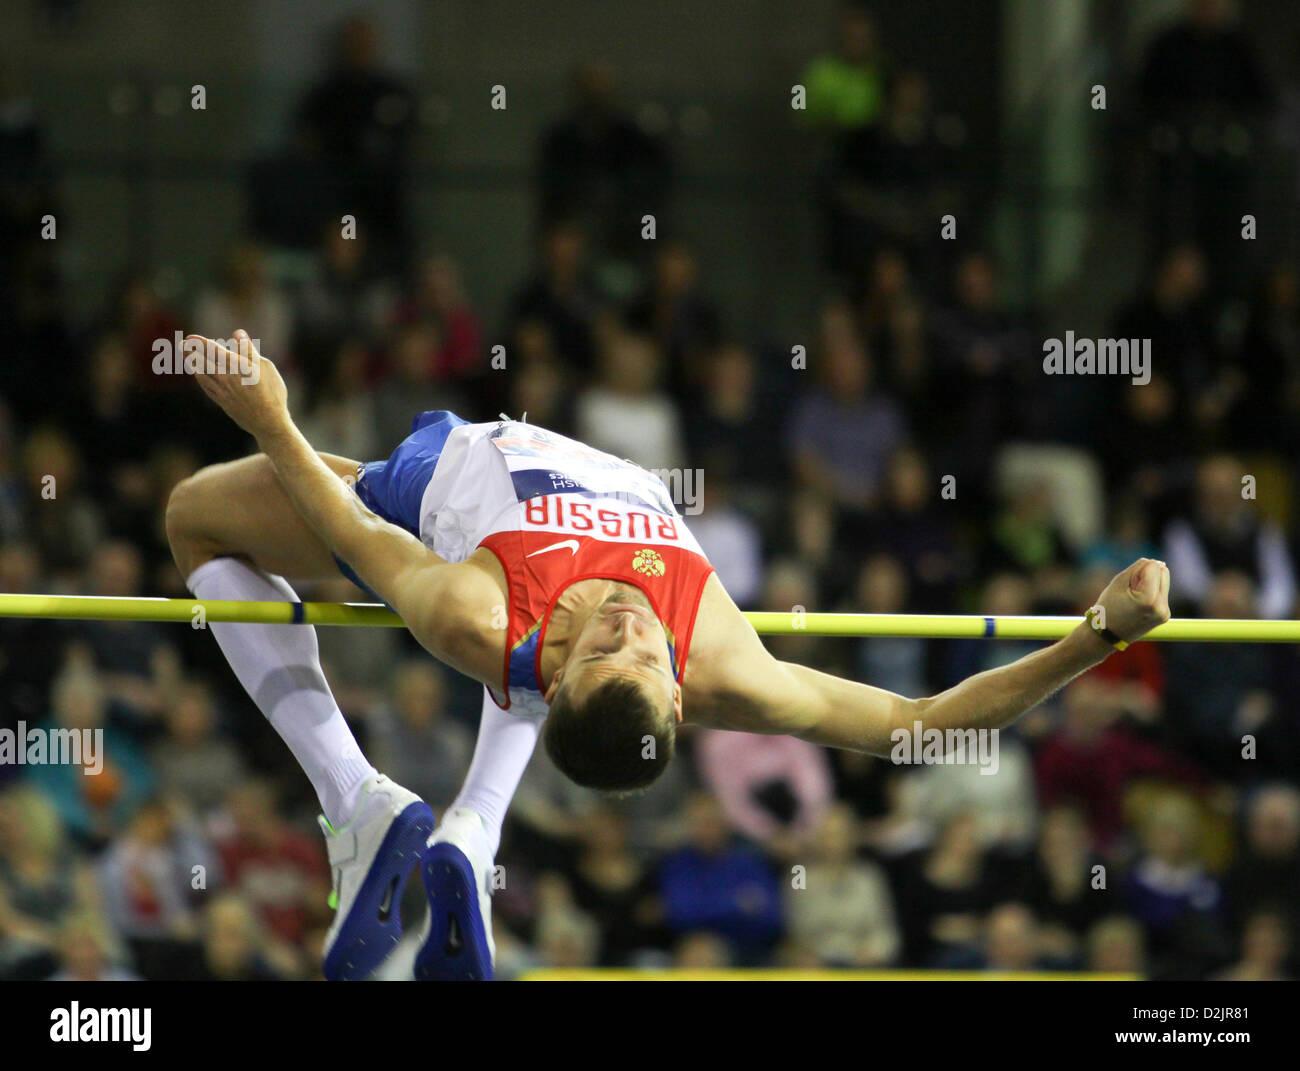 Glasgow, UK. 26th January 2013. Aleksey Dmitrik Russia 26.01.2013 British Athletics Glasgow International Match - Stock Image